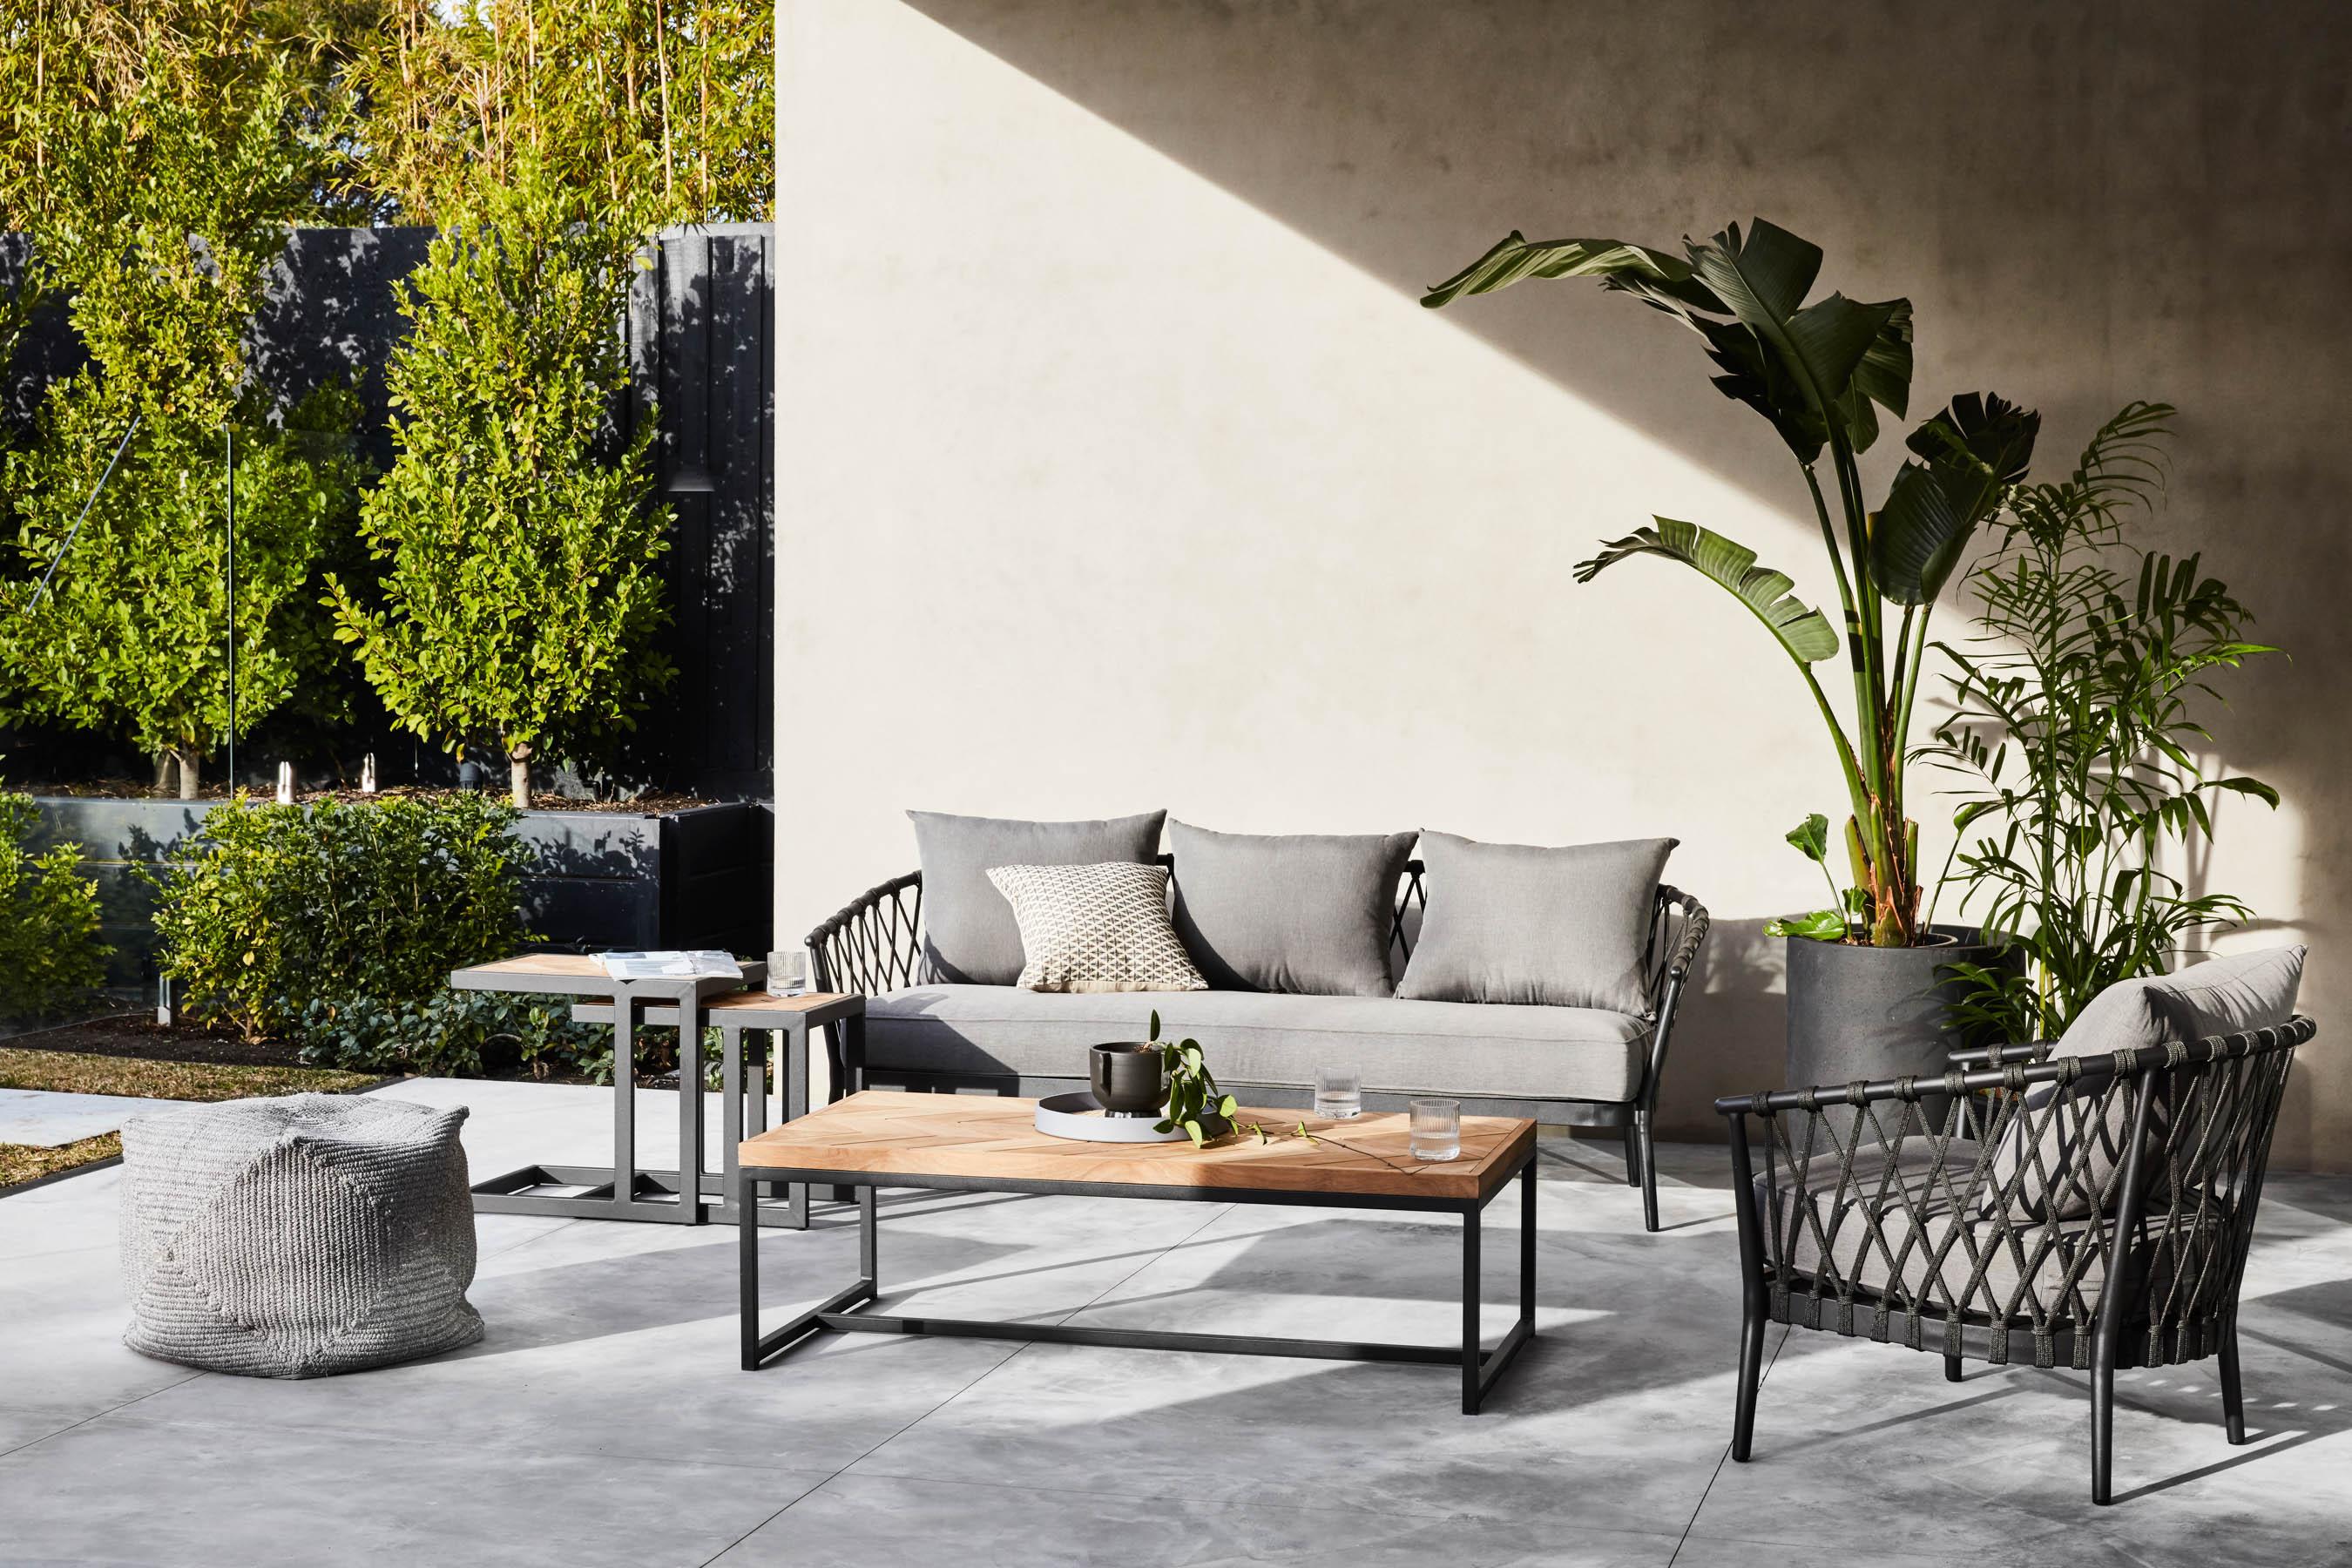 Furniture Gallery Sofas maui-three-seater-sofa-03